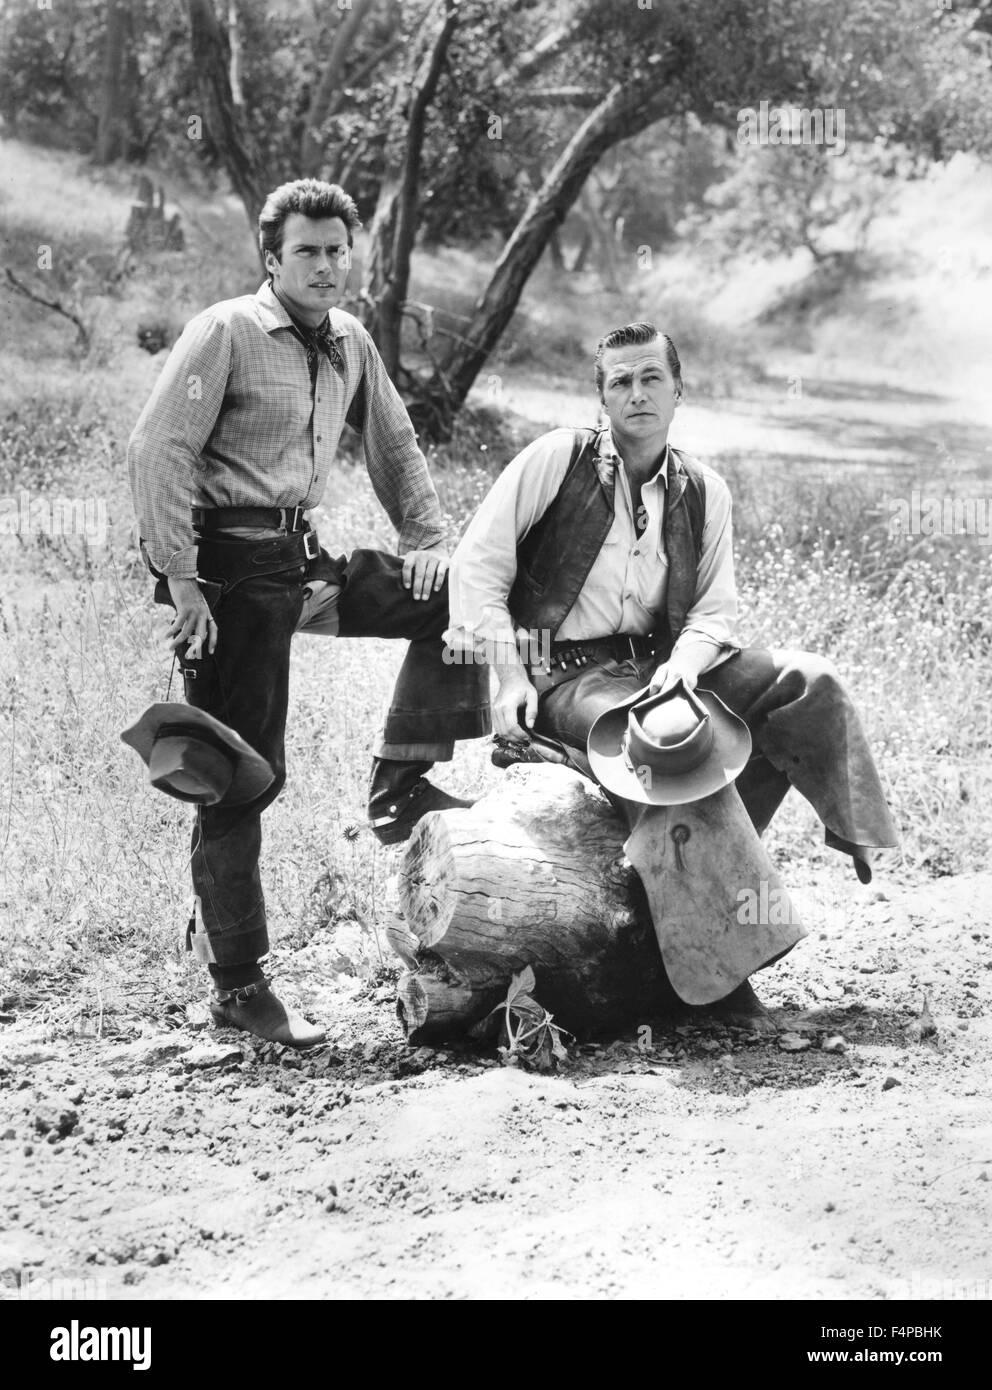 Clint Eastwood, Eric Fleming / Rawhide T.V. 1959 - Stock Image